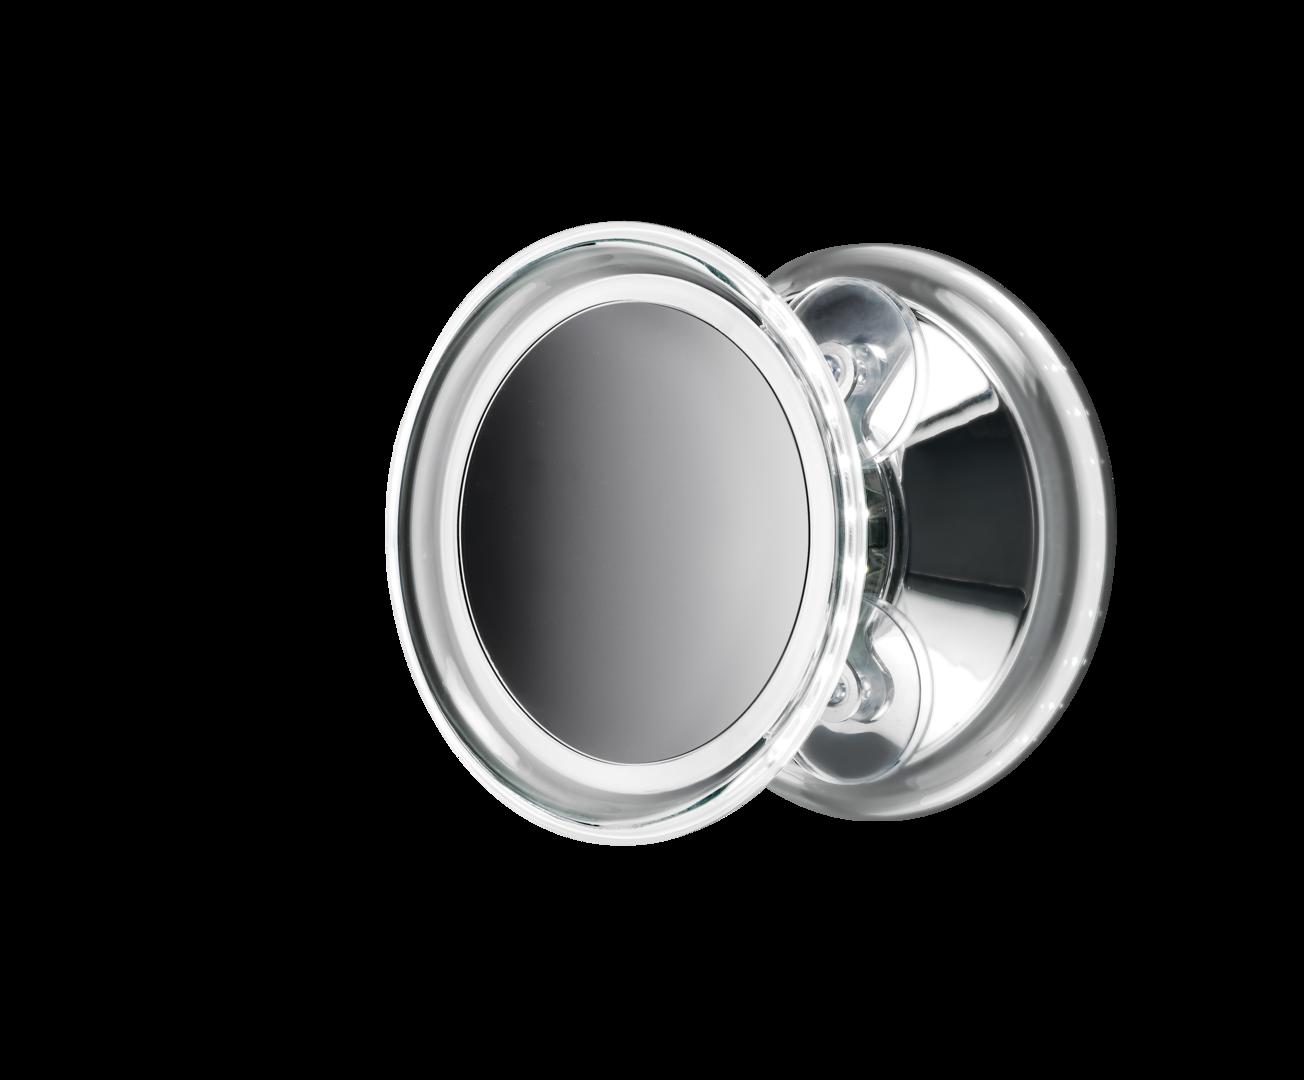 Modern Suction Cup Mirror Bathroom Ensign - Bathroom Design Ideas ...